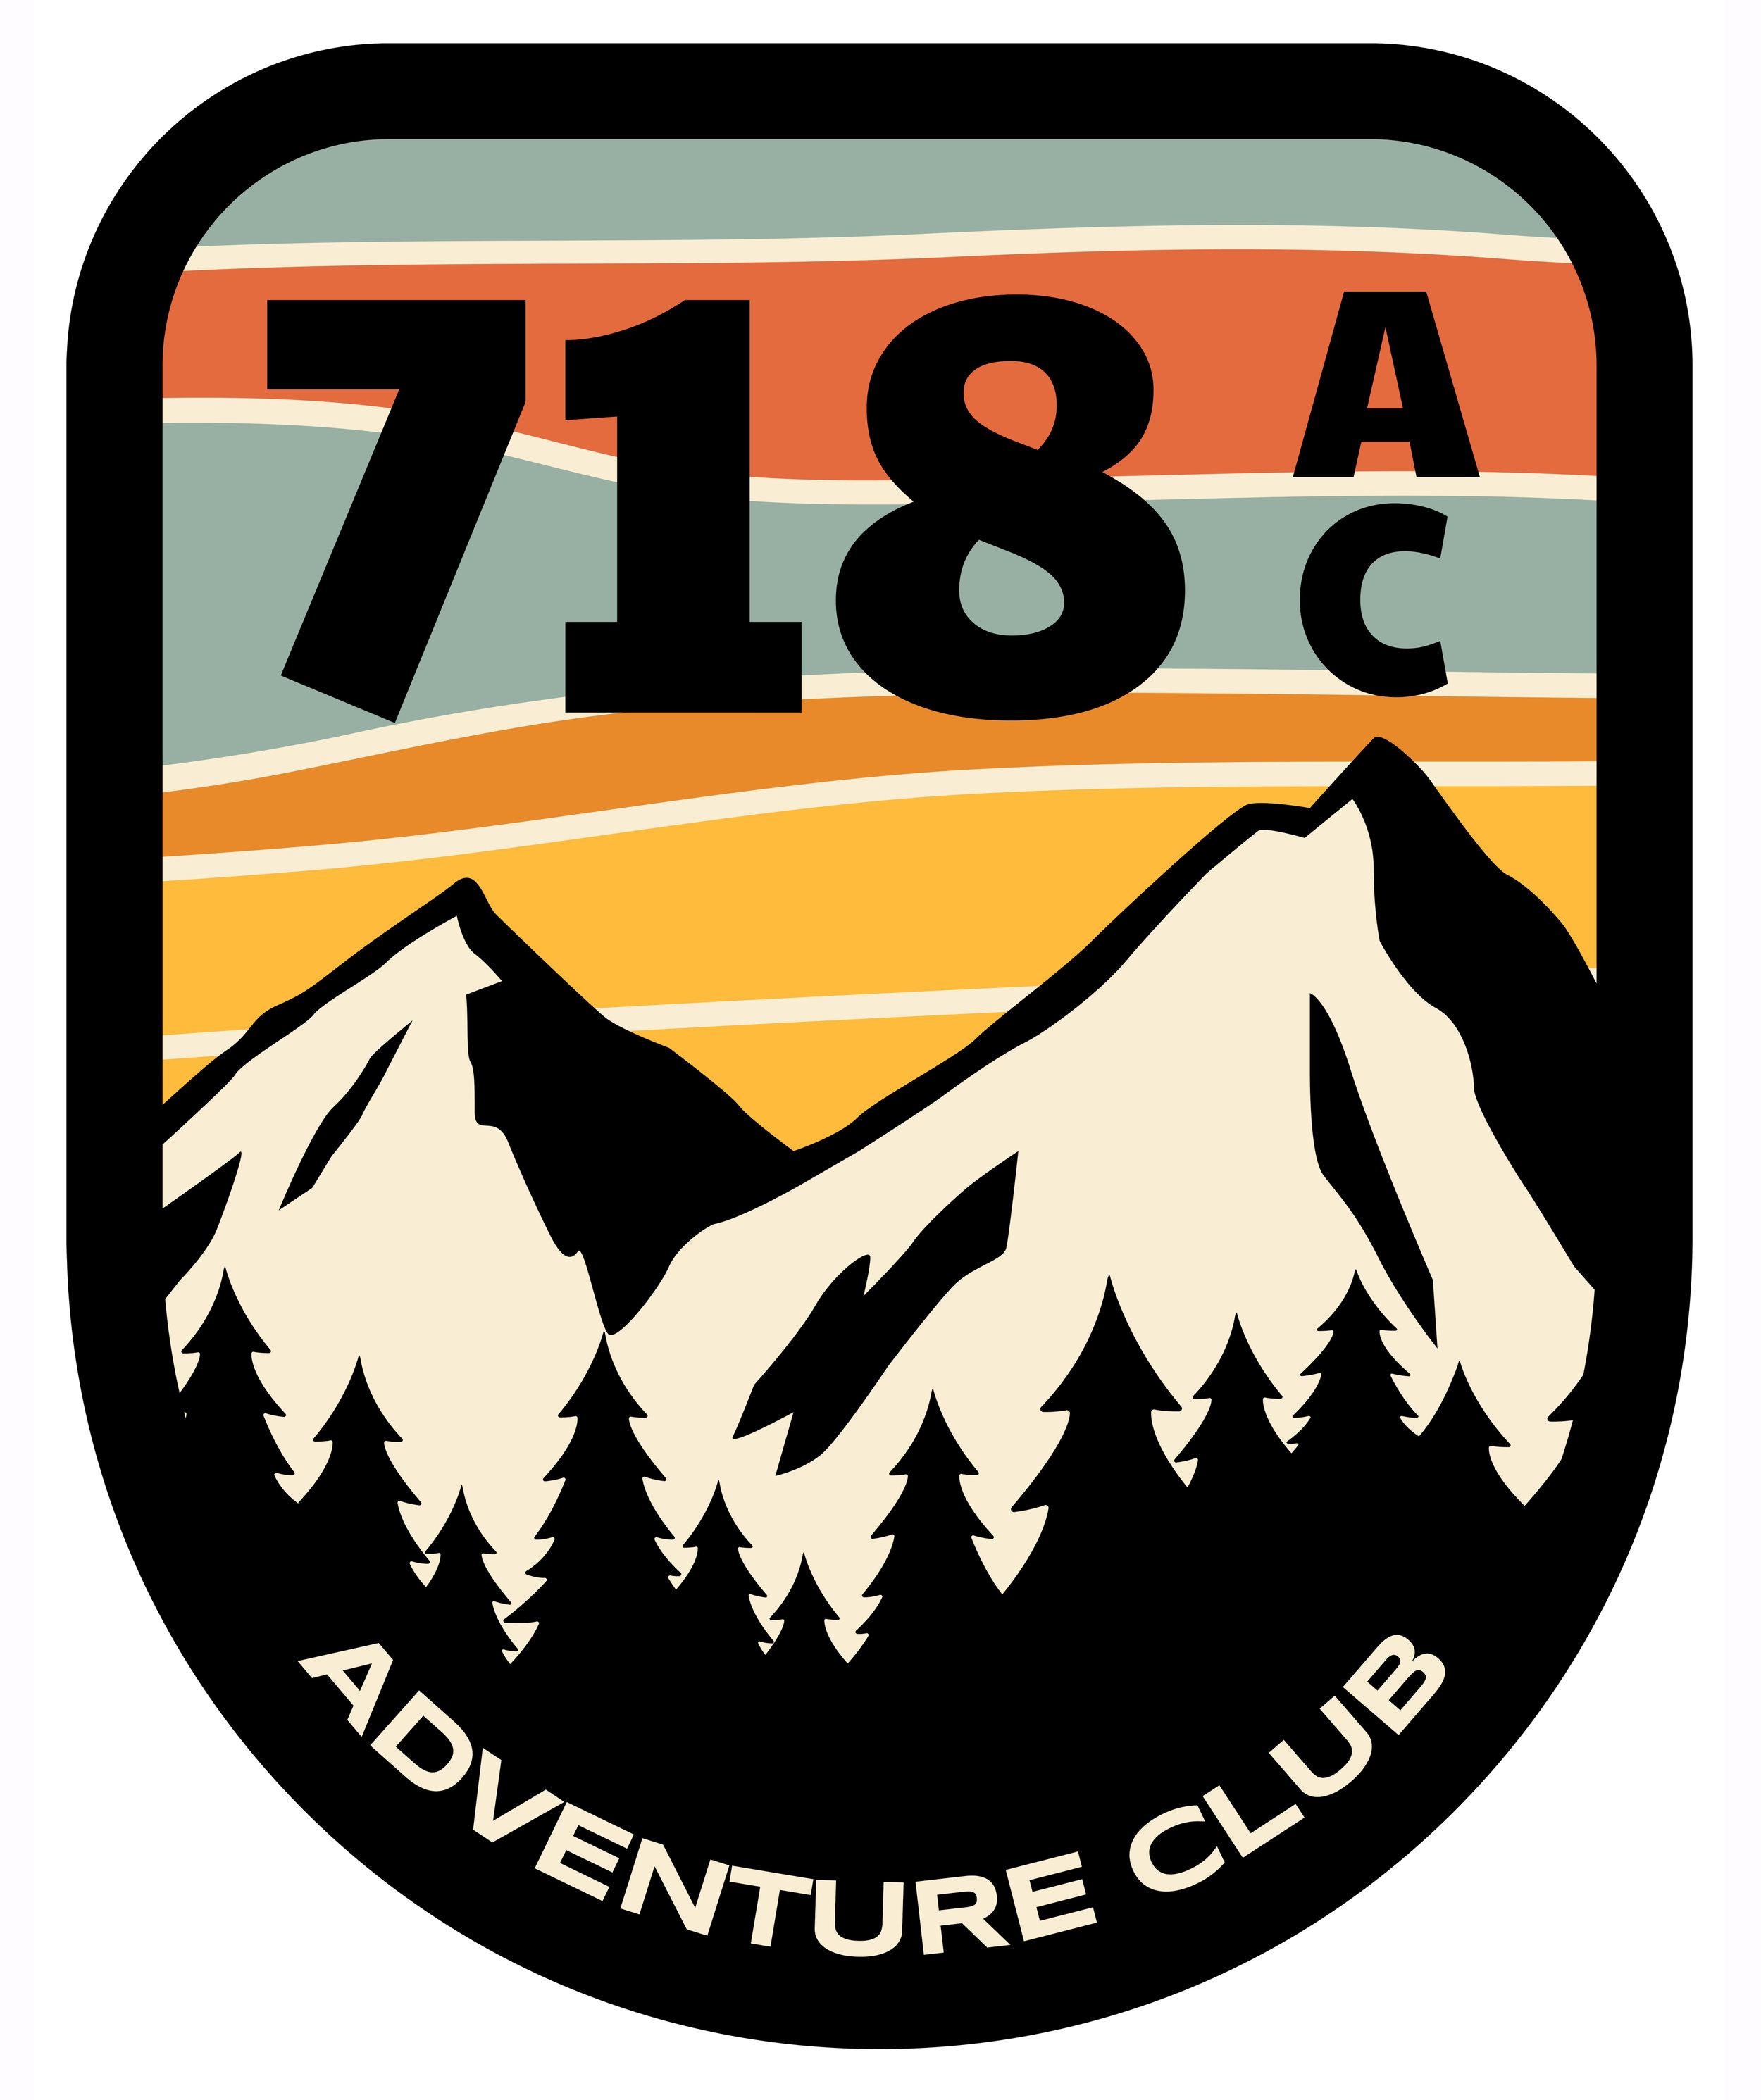 718 Adventure Club clip.jpg